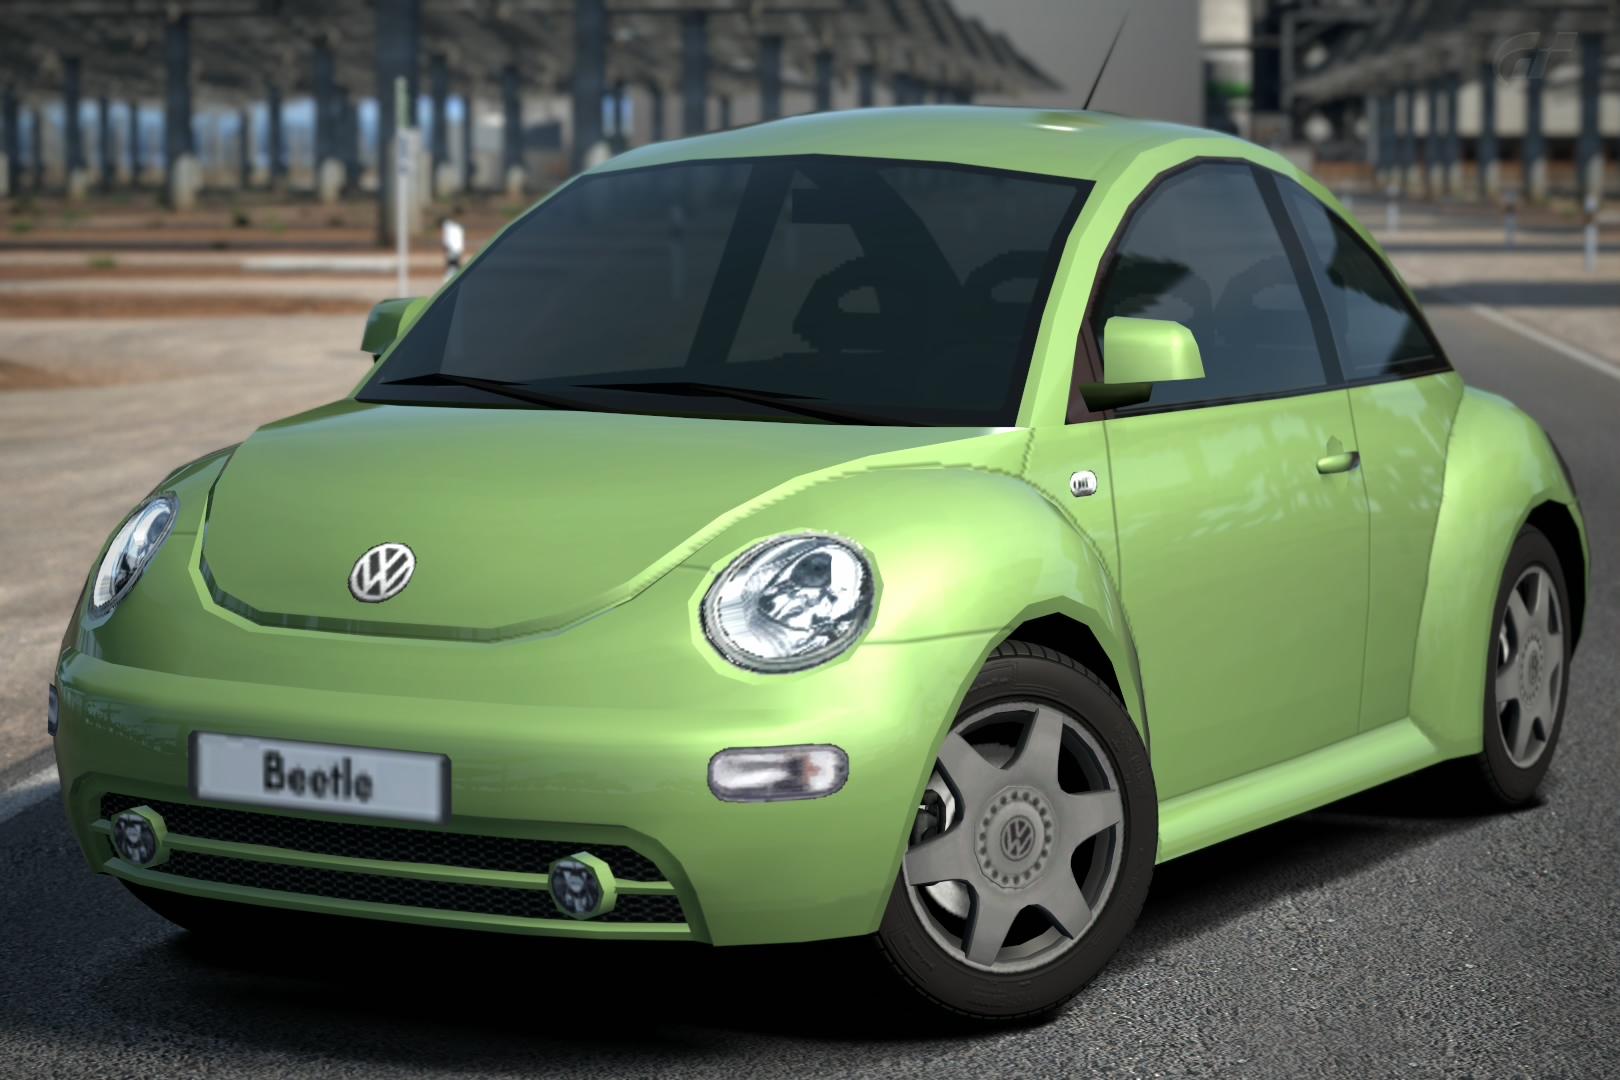 volkswagen new beetle 2 0 39 00 gran turismo wiki fandom powered by wikia. Black Bedroom Furniture Sets. Home Design Ideas